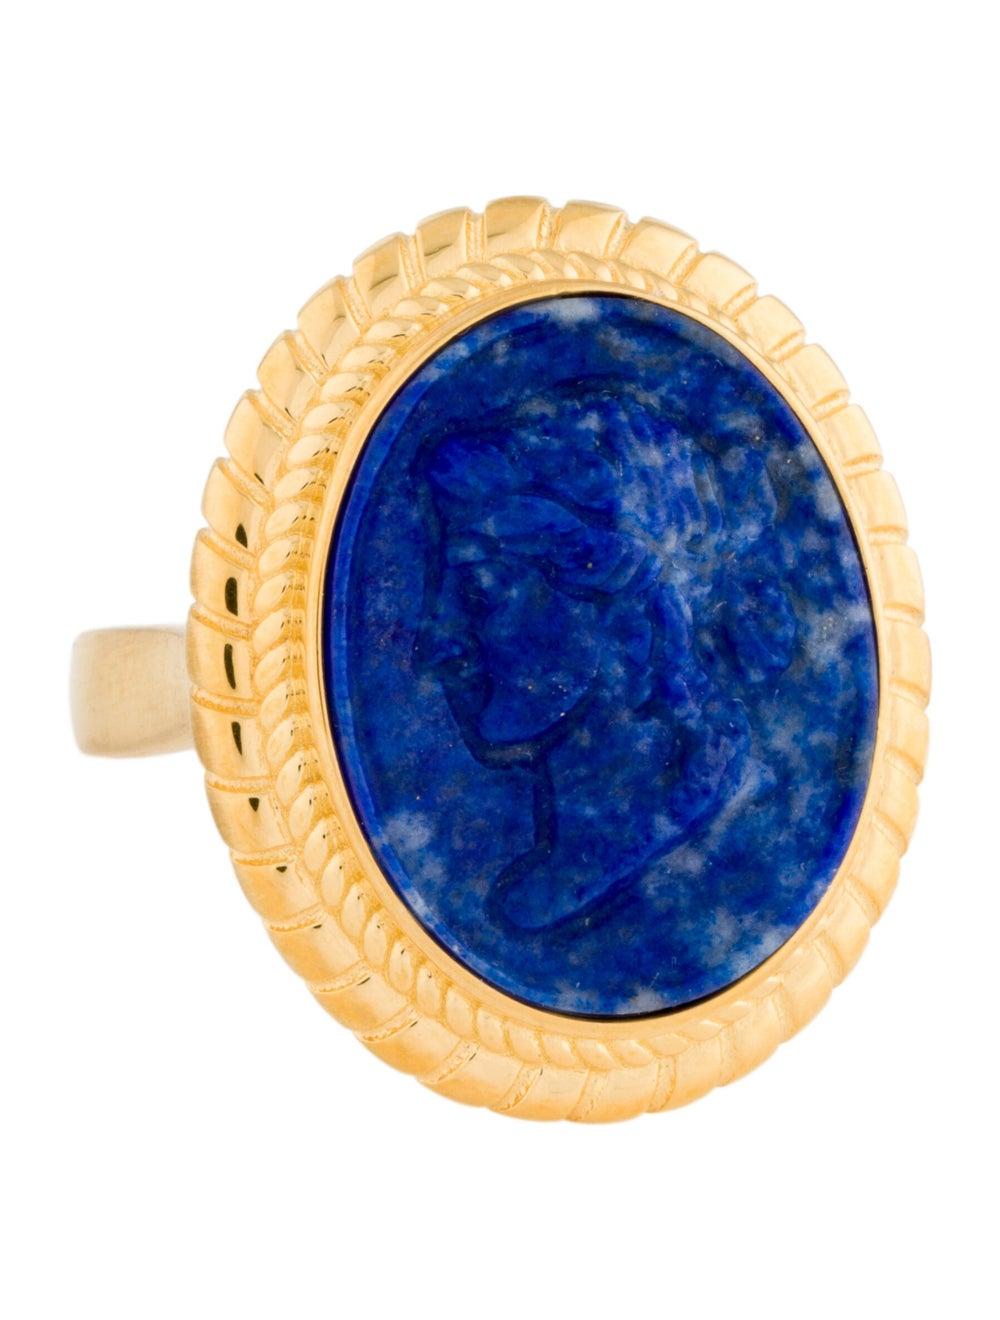 Tagliamonte Lapis Lazuli Cameo Cocktail Ring Gold - image 1